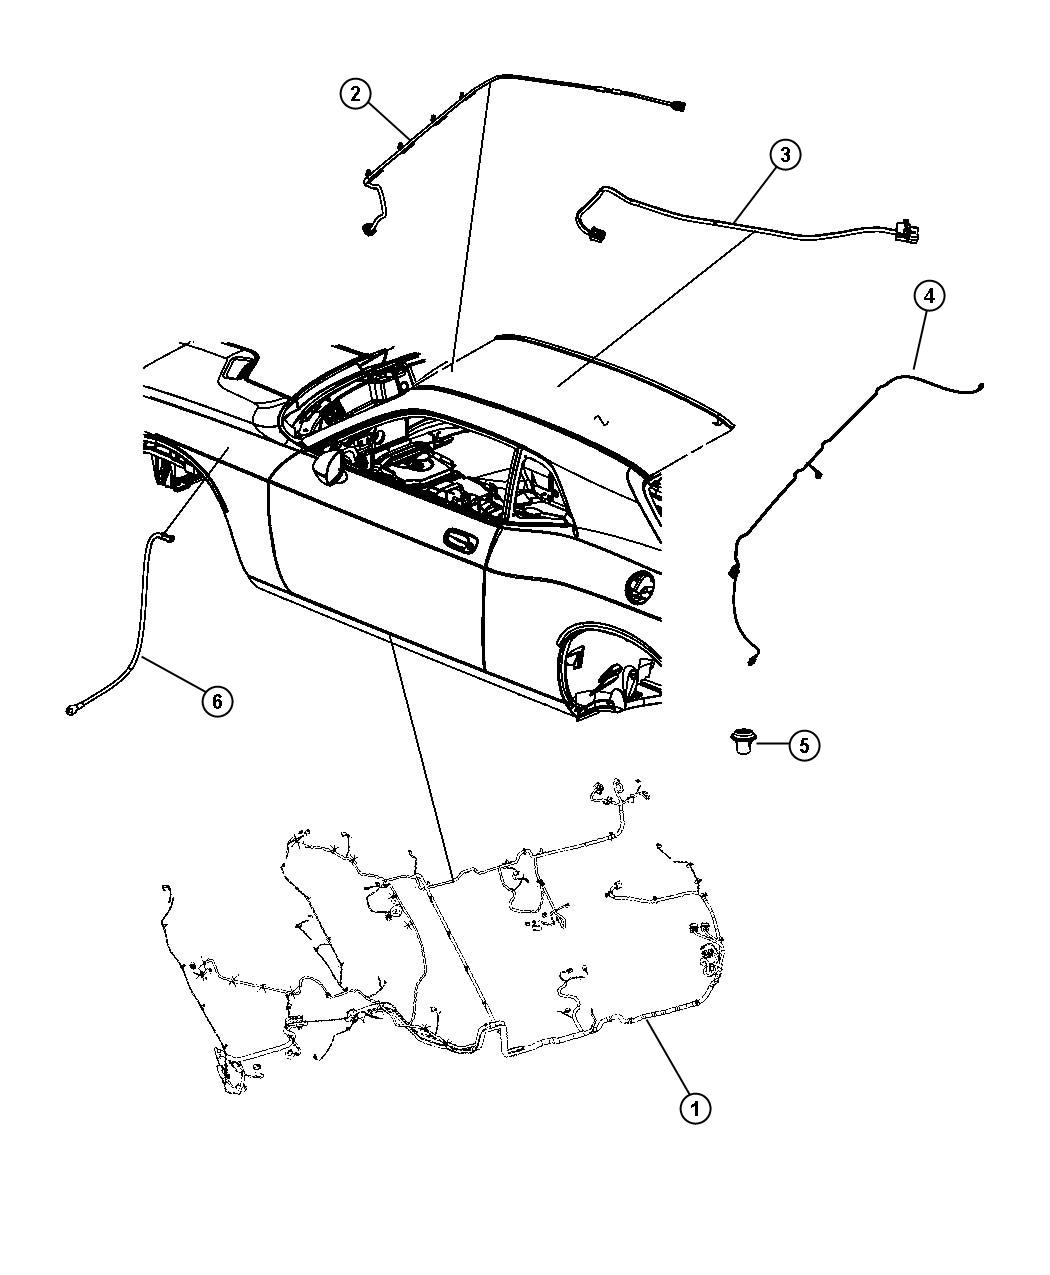 2009 Dodge Challenger Wiring. Rear fascia. [dual rear